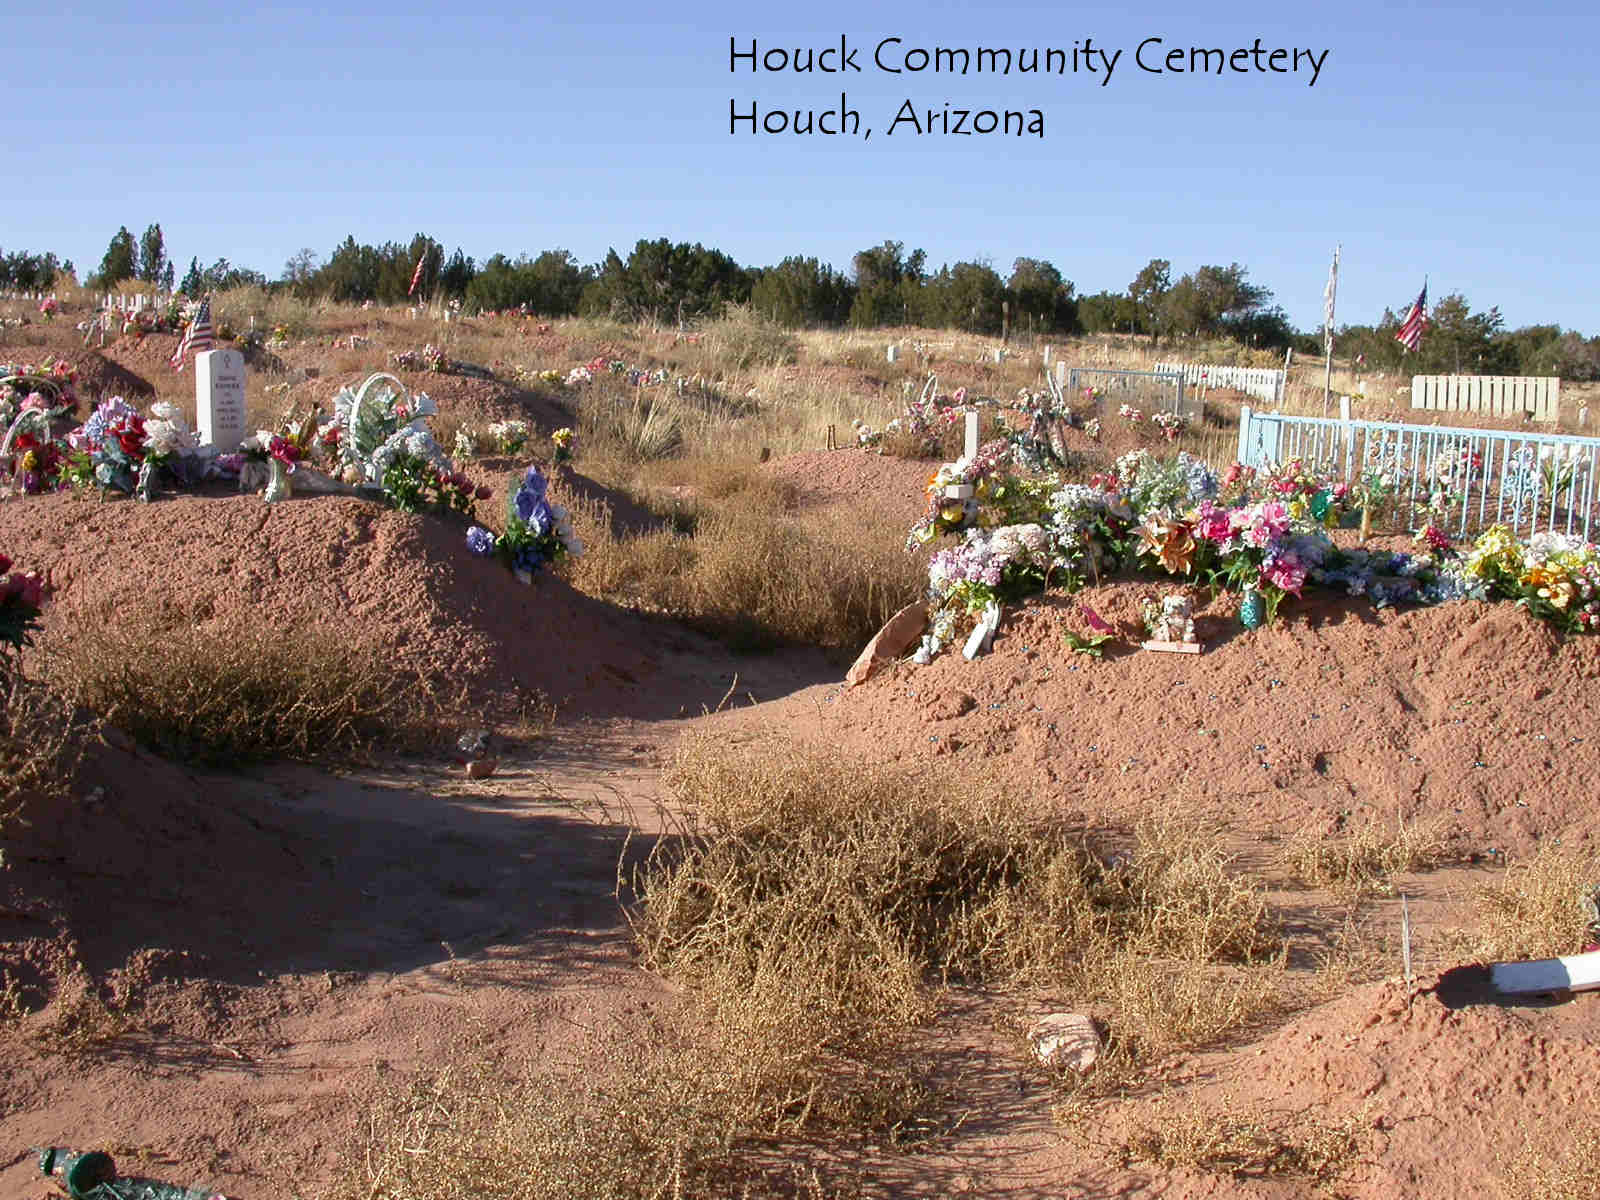 Houck Community Cemetery